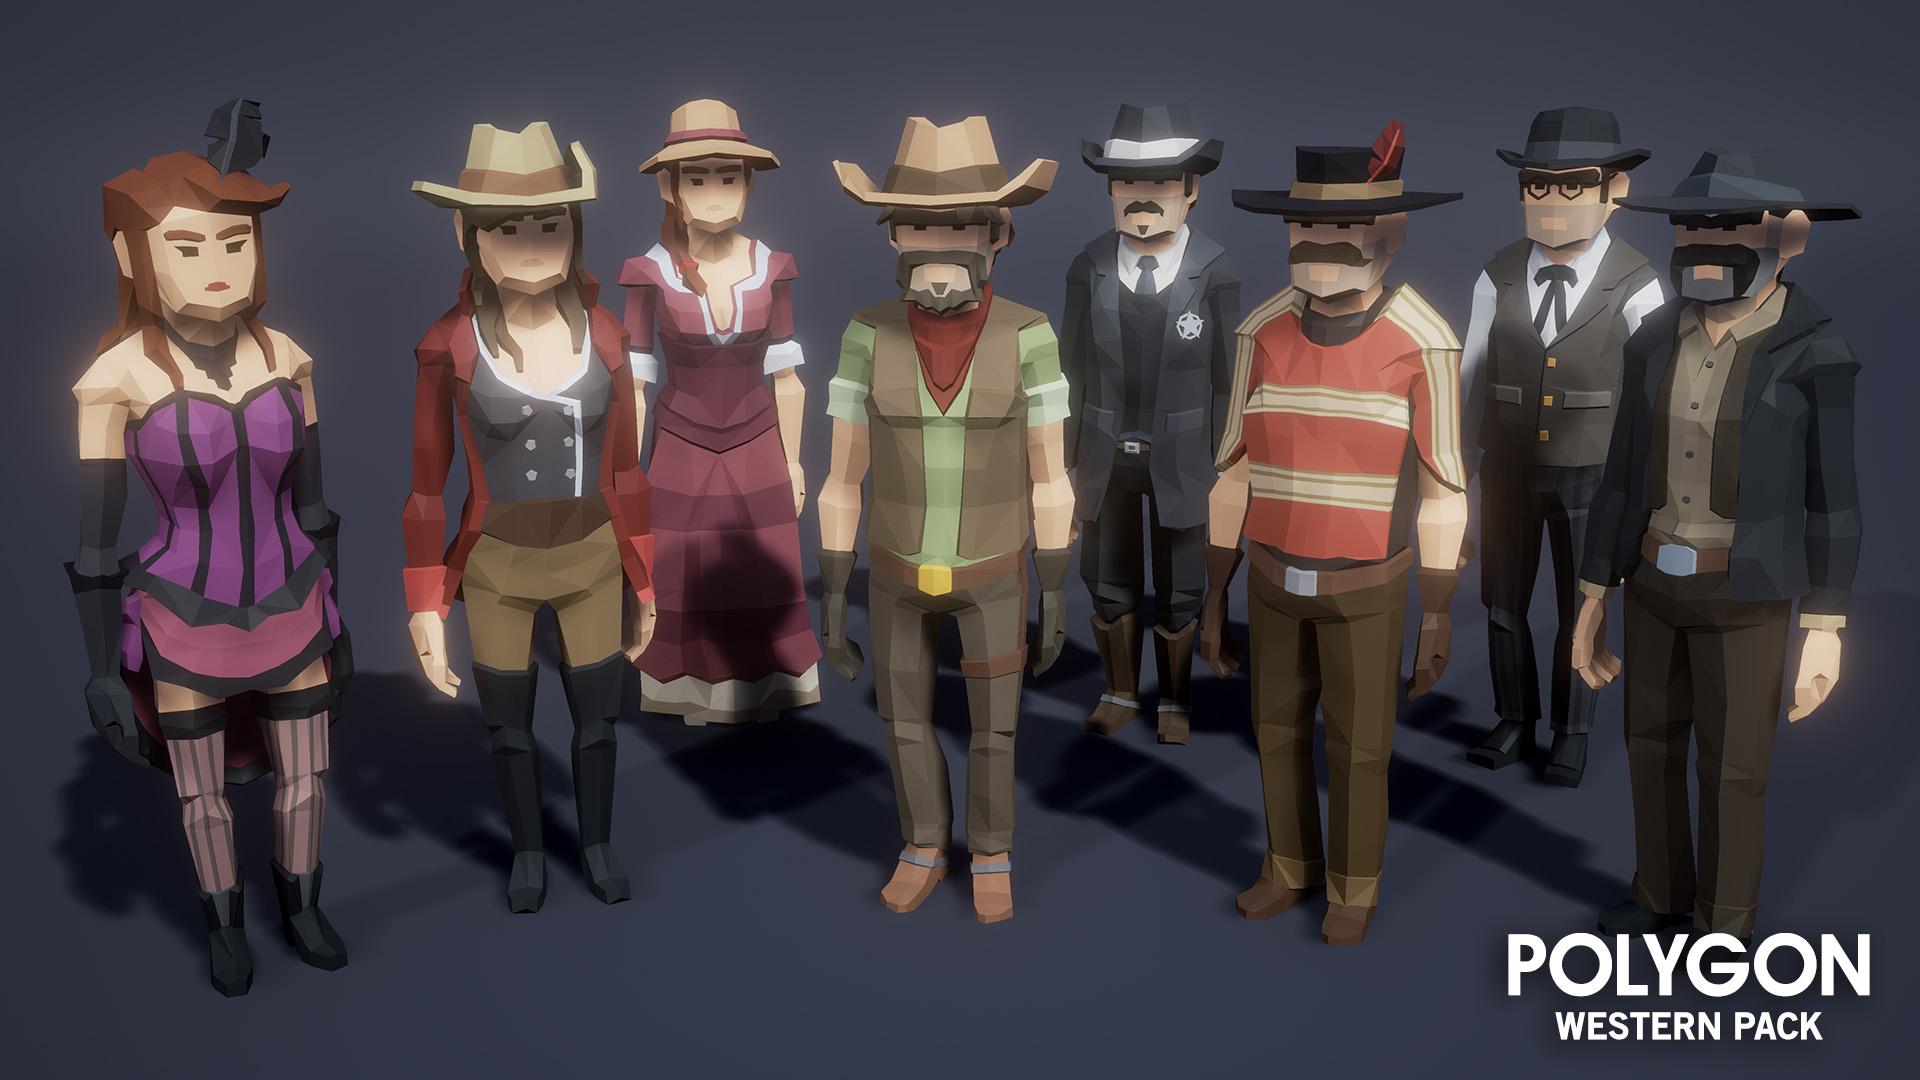 POLYGON Western Pack